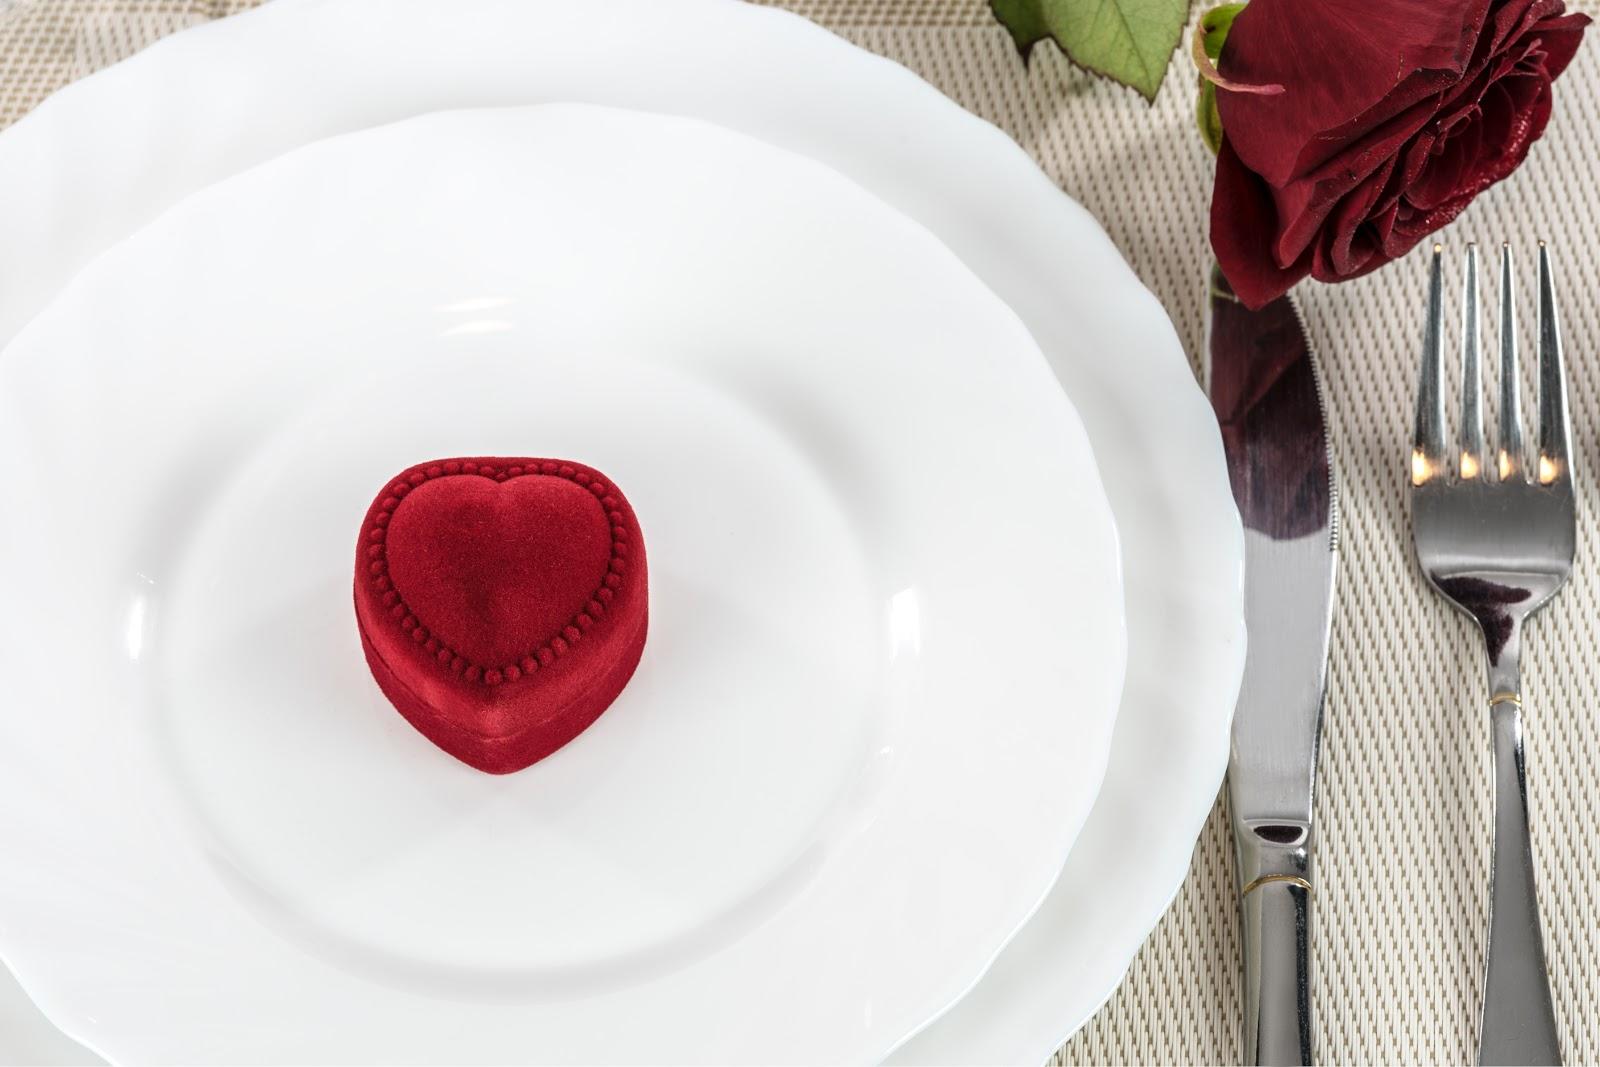 Vanetine's Dinner Date